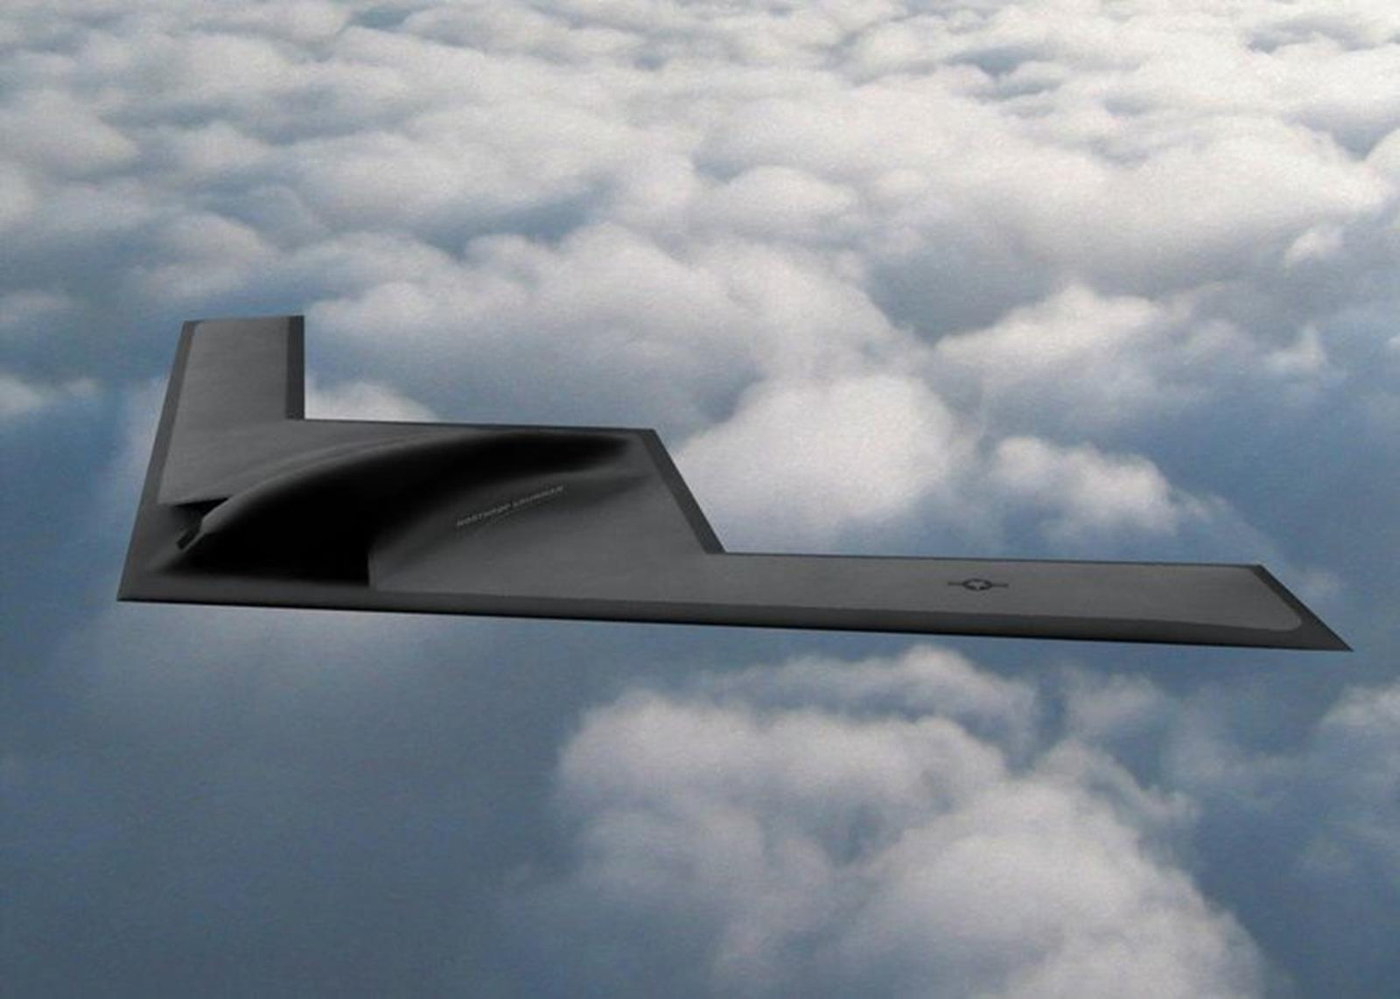 Produkcja bombowców B-21 Raider, produkcja B-21 Raider, B-21 Raider